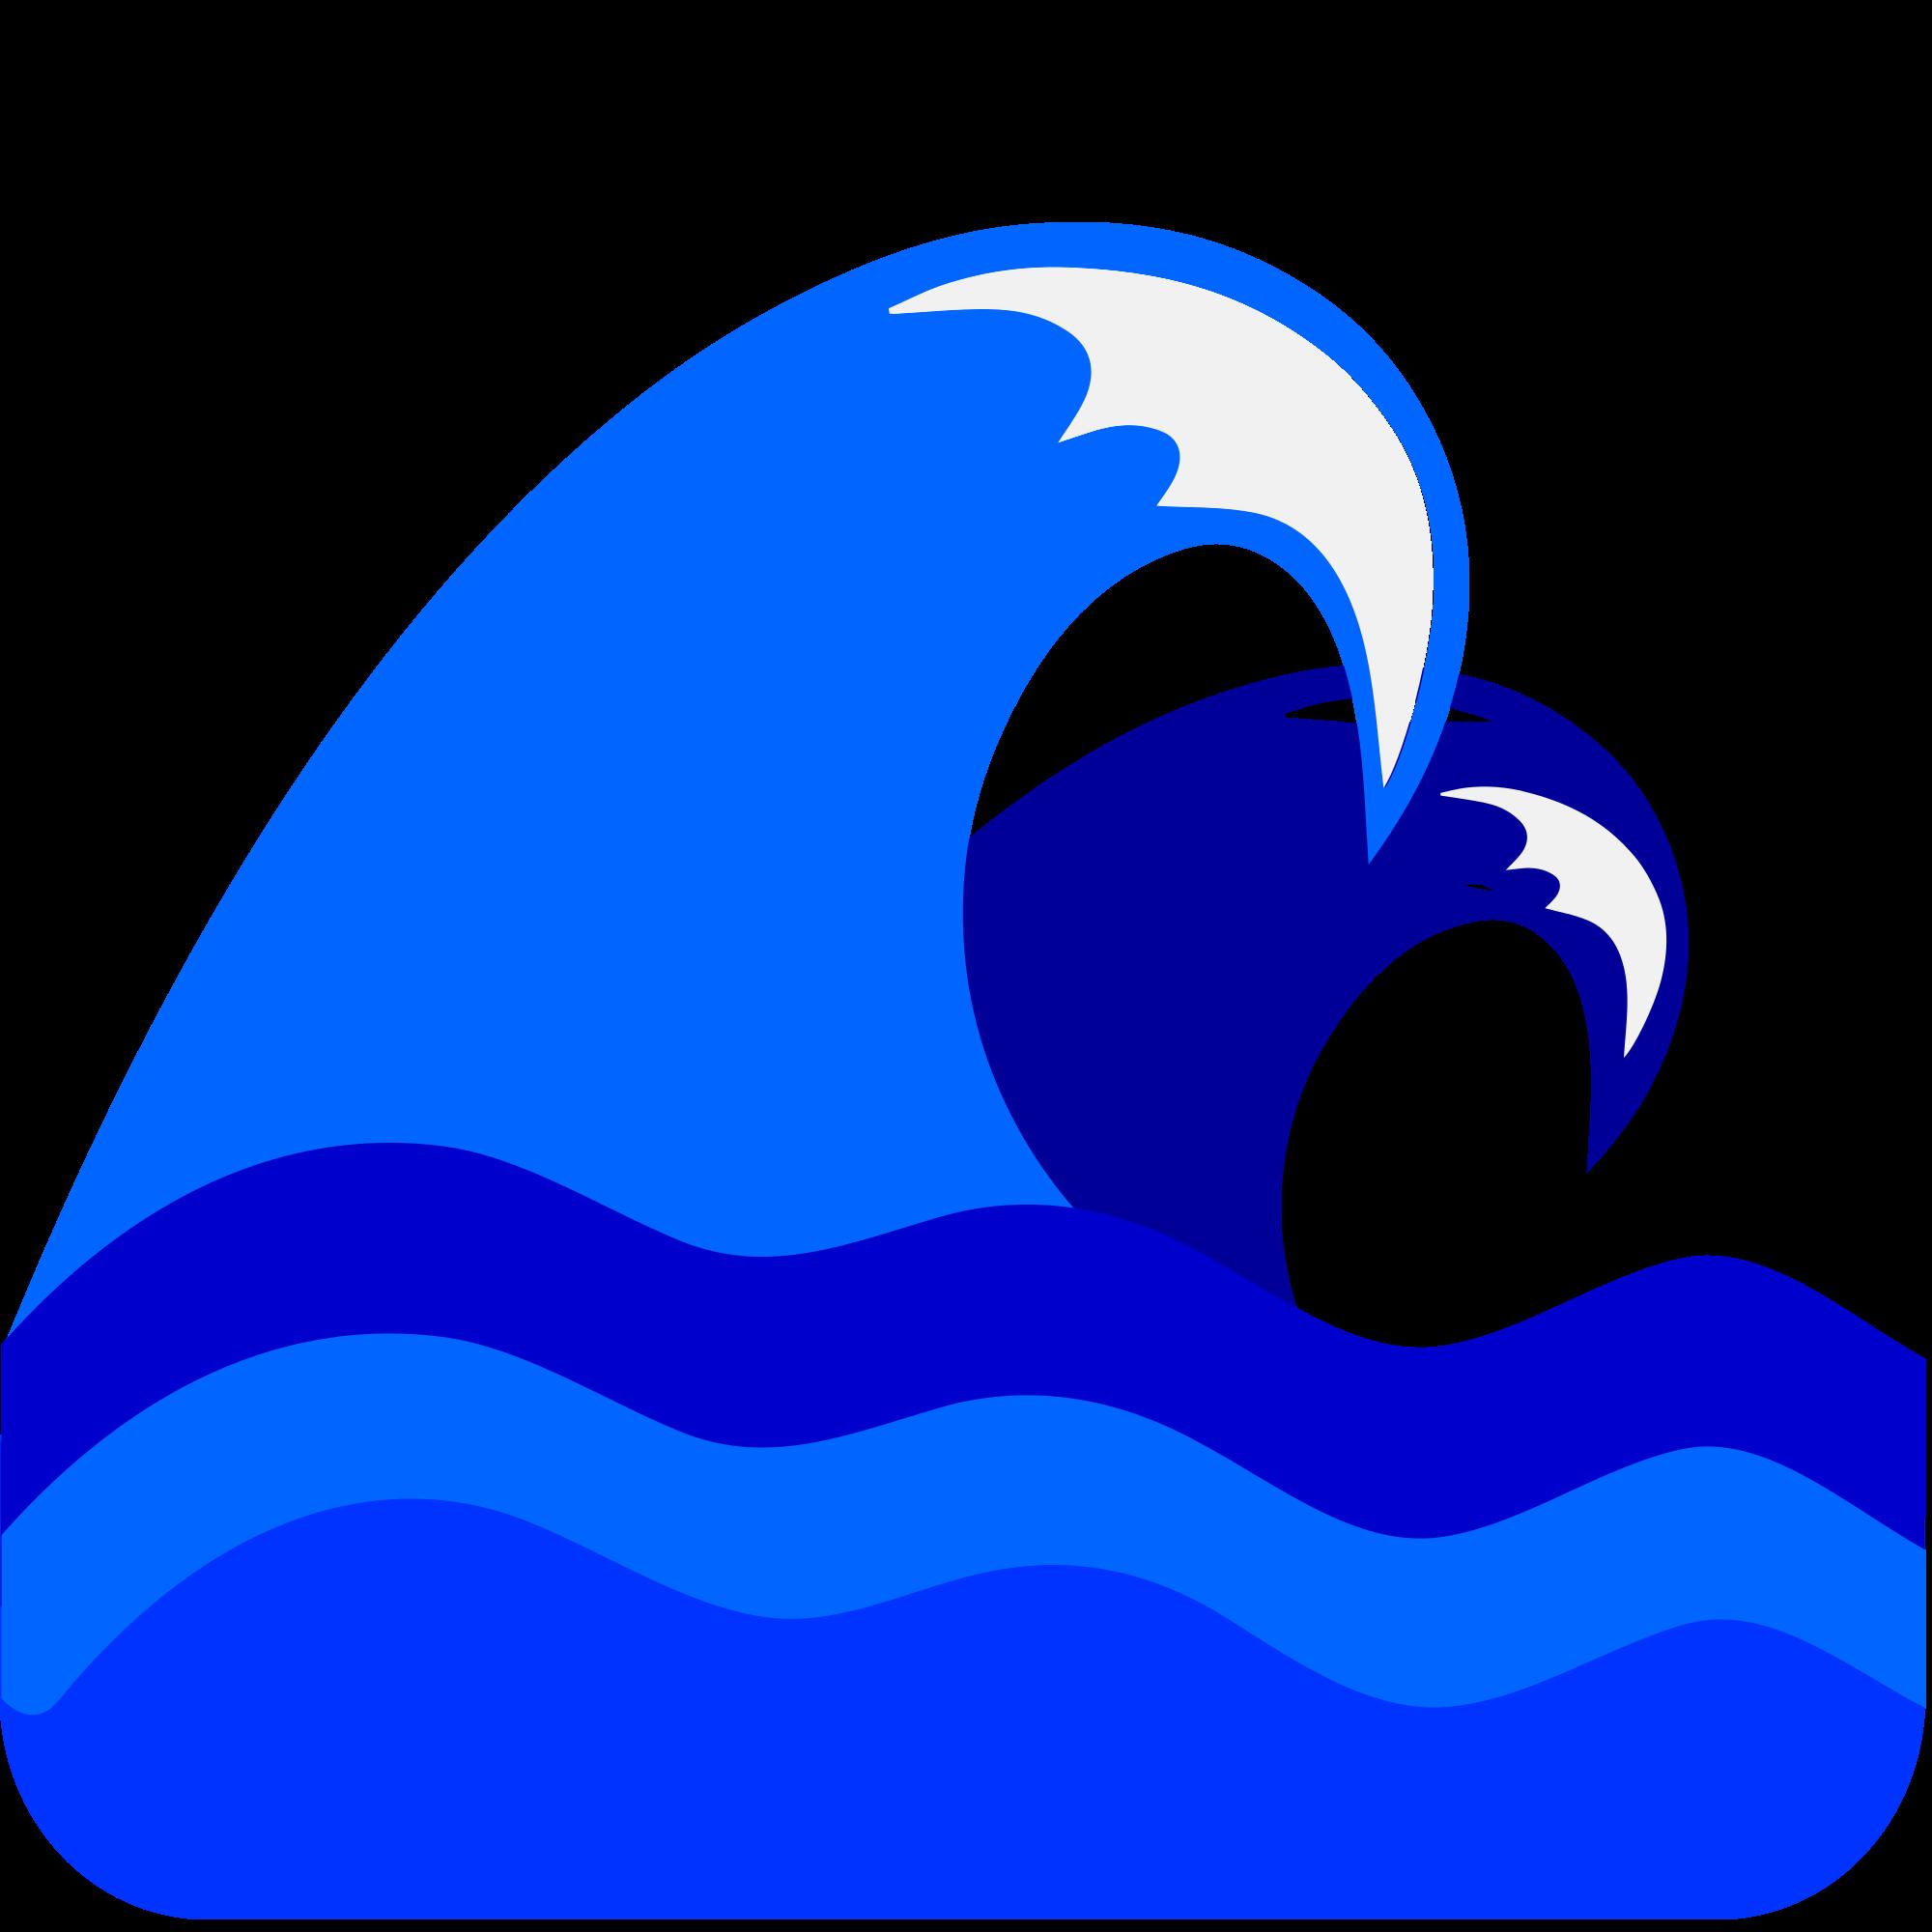 Blue sea svg wikimedia. Clipart wave file